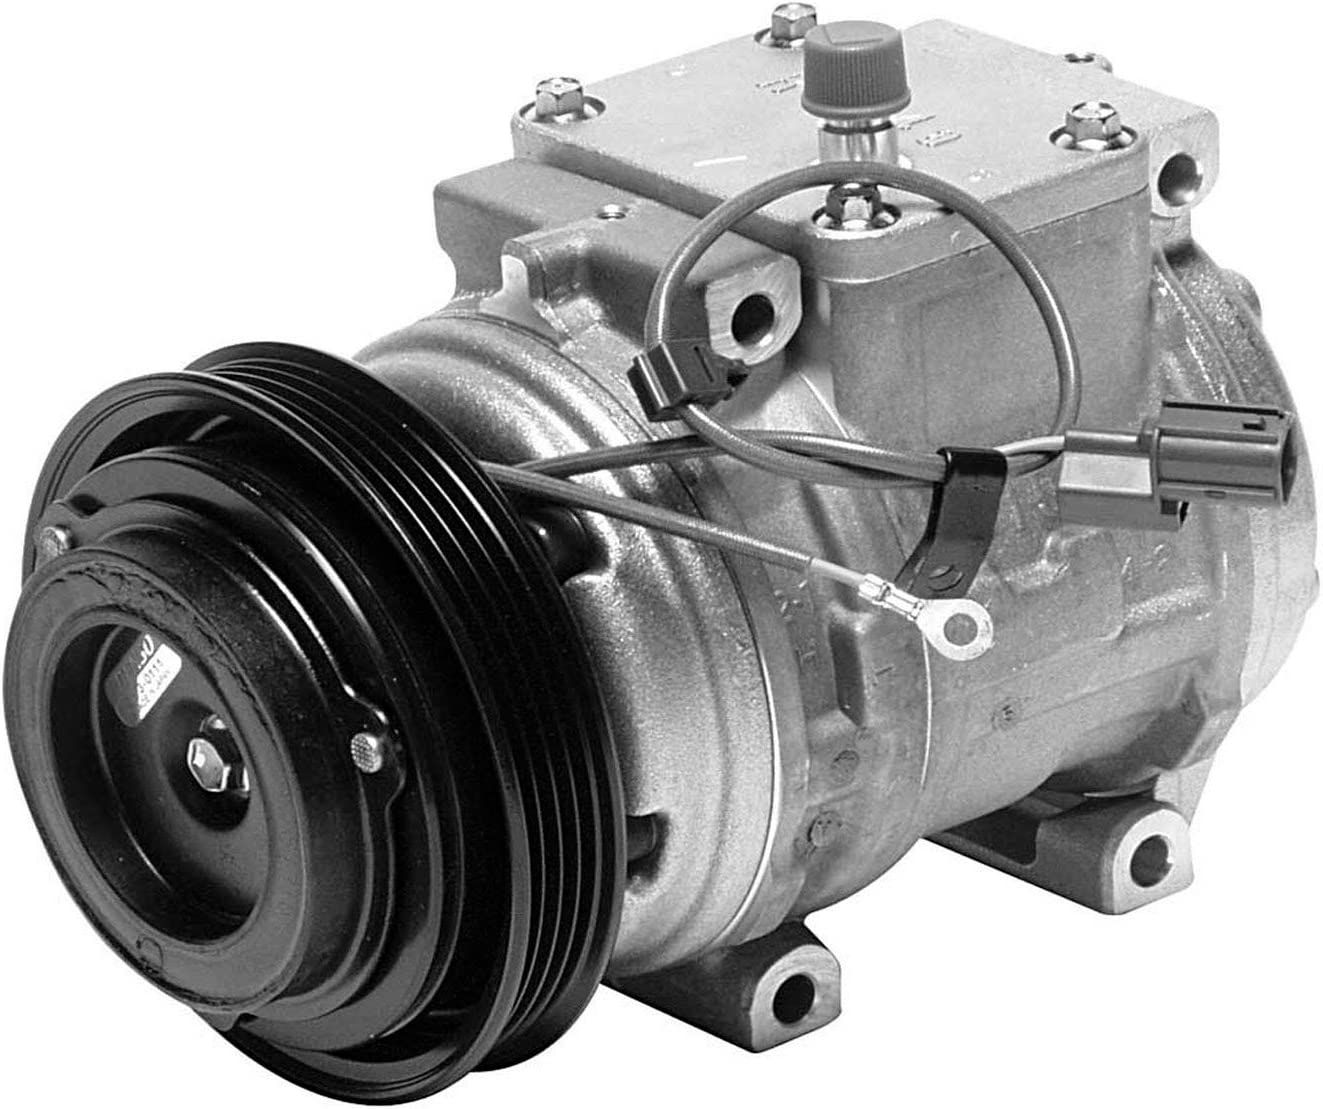 Lunati XXX12232H Bootlegger Stage 2 Hydraulic Flat Cam for 283-400 Chevrolet Small Block